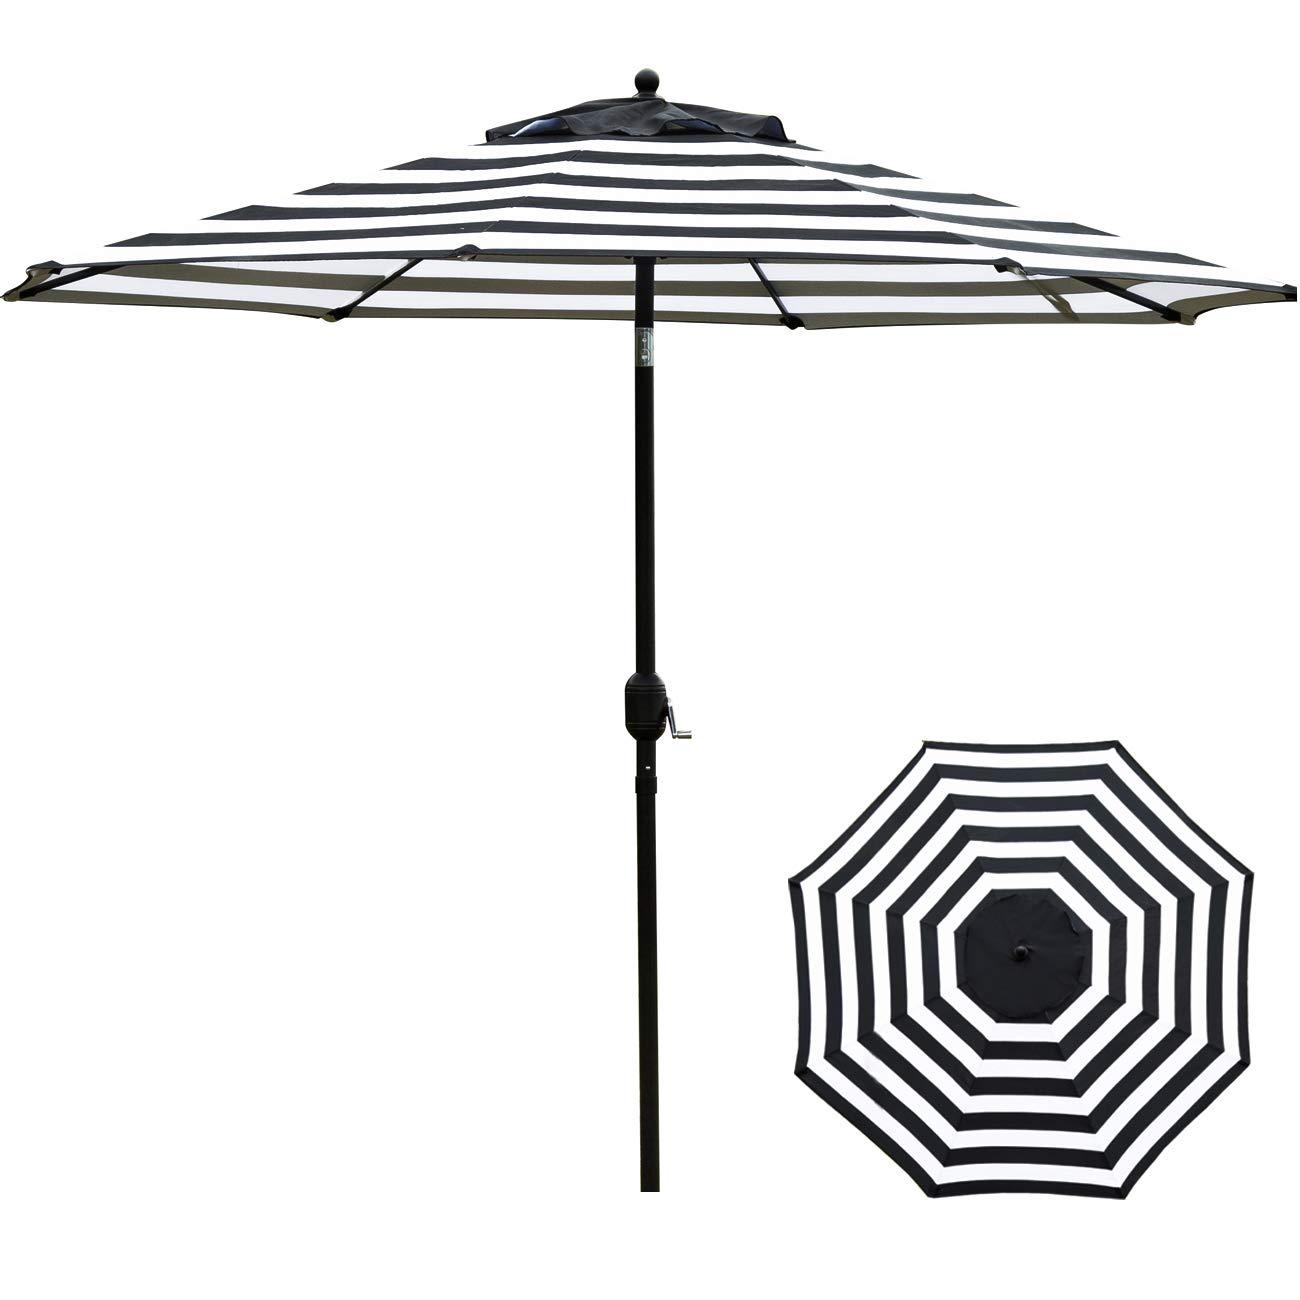 Sunnyglade 11Ft Patio Umbrella Garden Canopy Outdoor Table Market Umbrella with Tilt and Crank (Black and White)